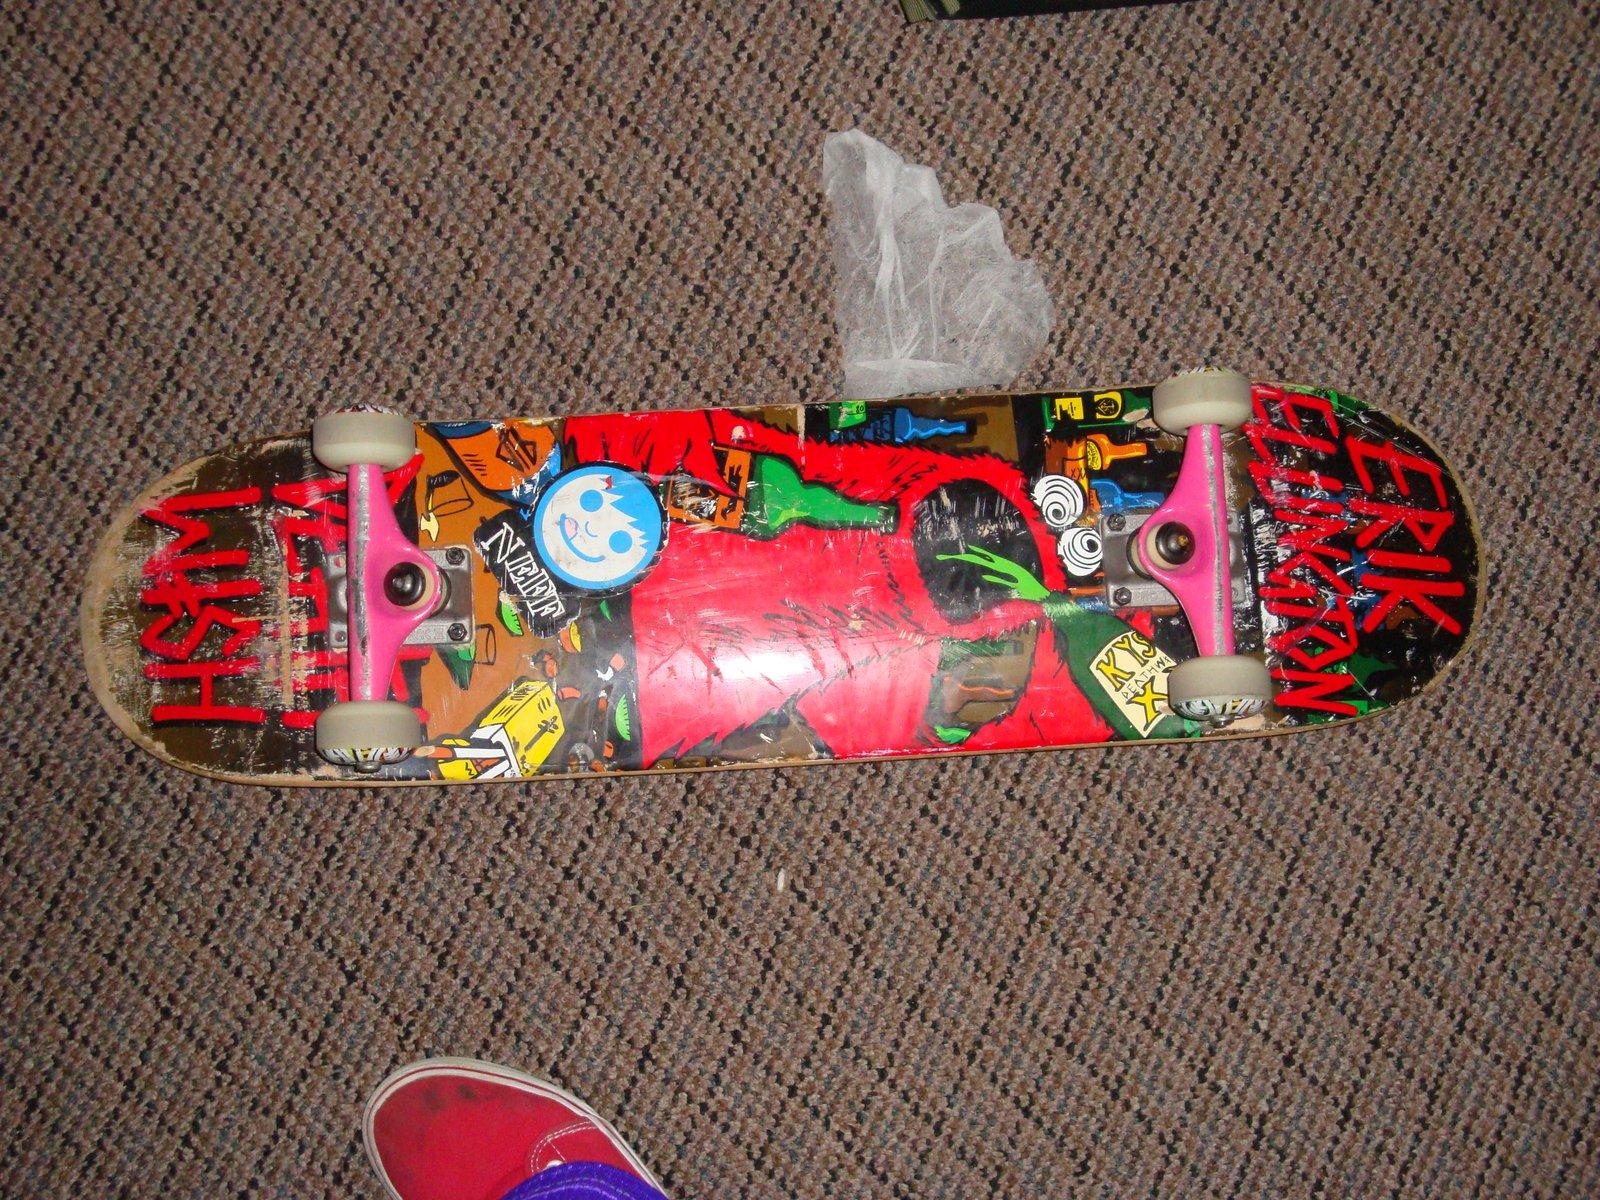 Death Wish board